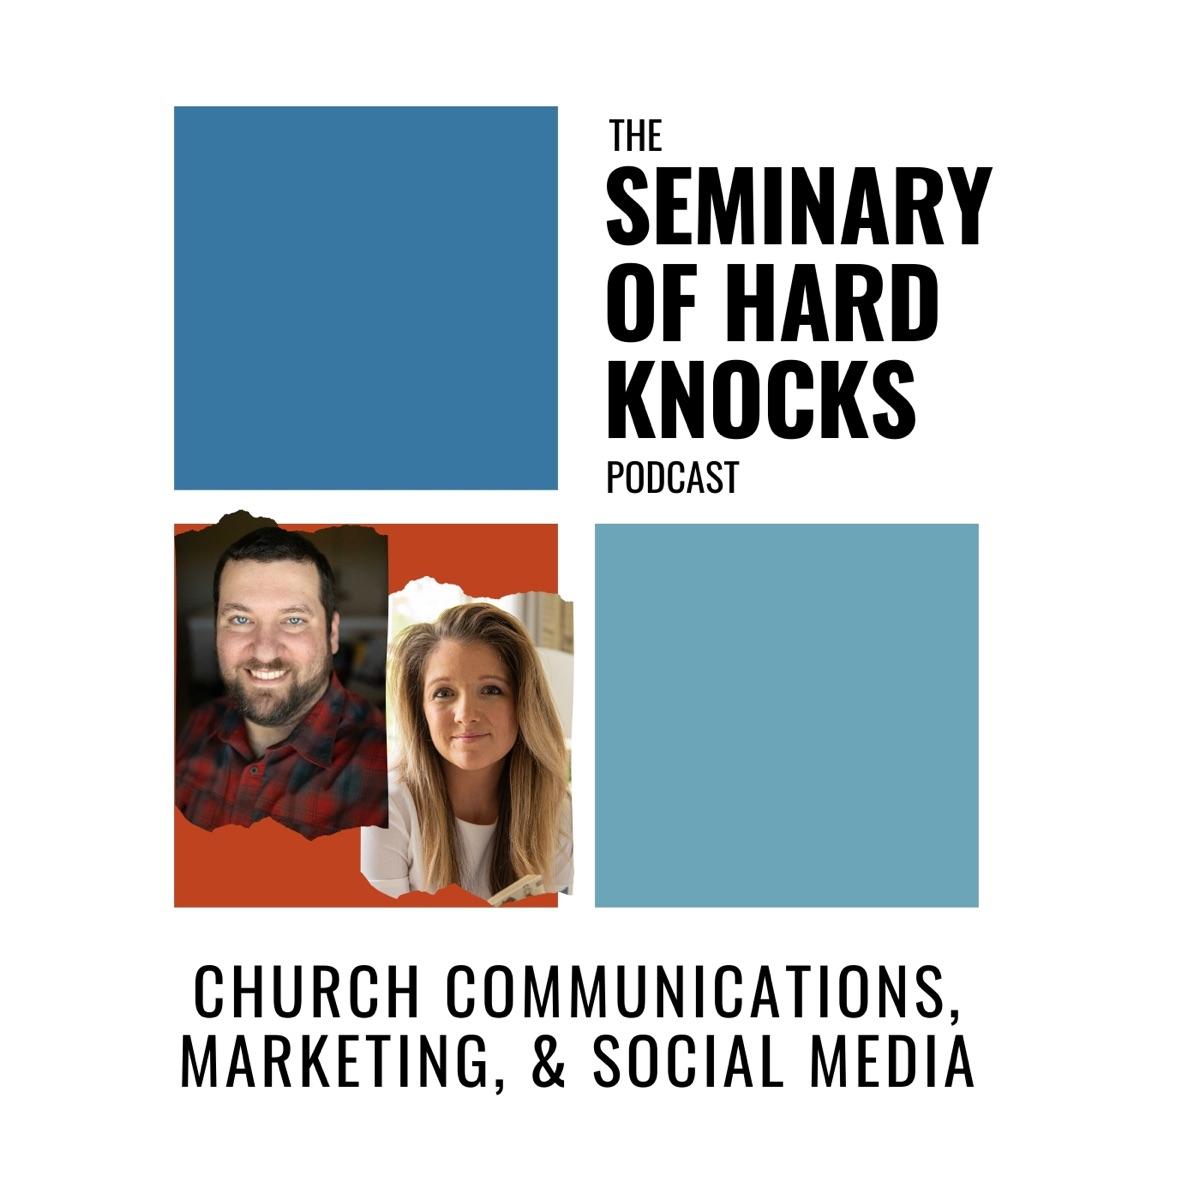 The Seminary of Hard Knocks Podcast | Church Communications, Marketing, and Social Media